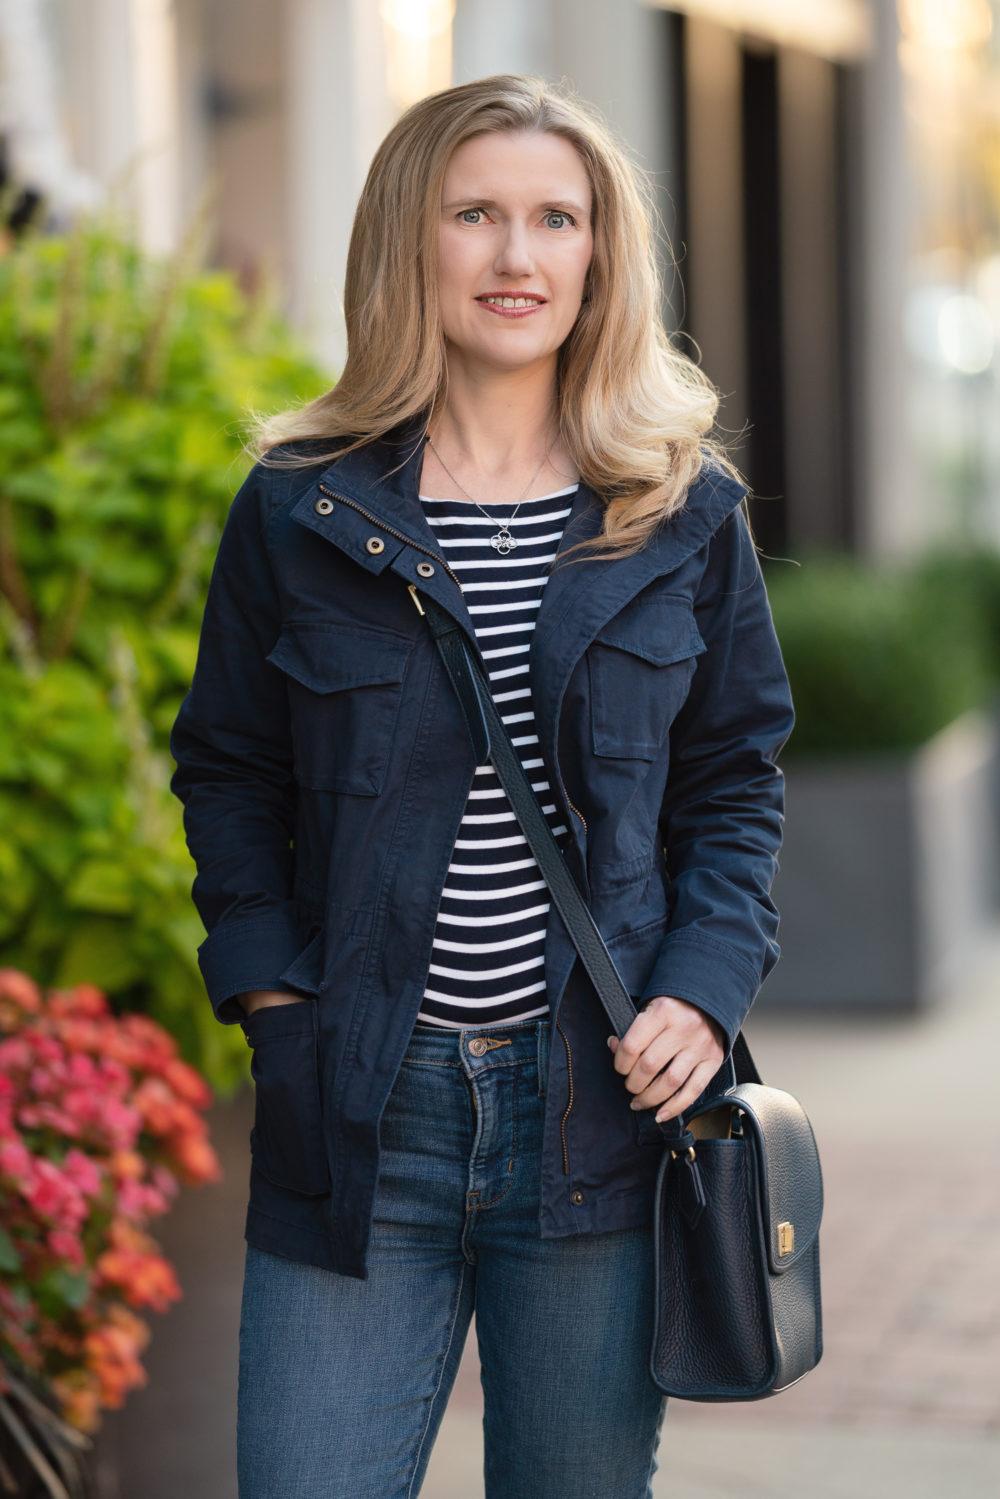 Petite Fashion Blog | Amazon Essentials Utility Jacket | Women's Jackets on Amazon | Amazon Fall Jackets